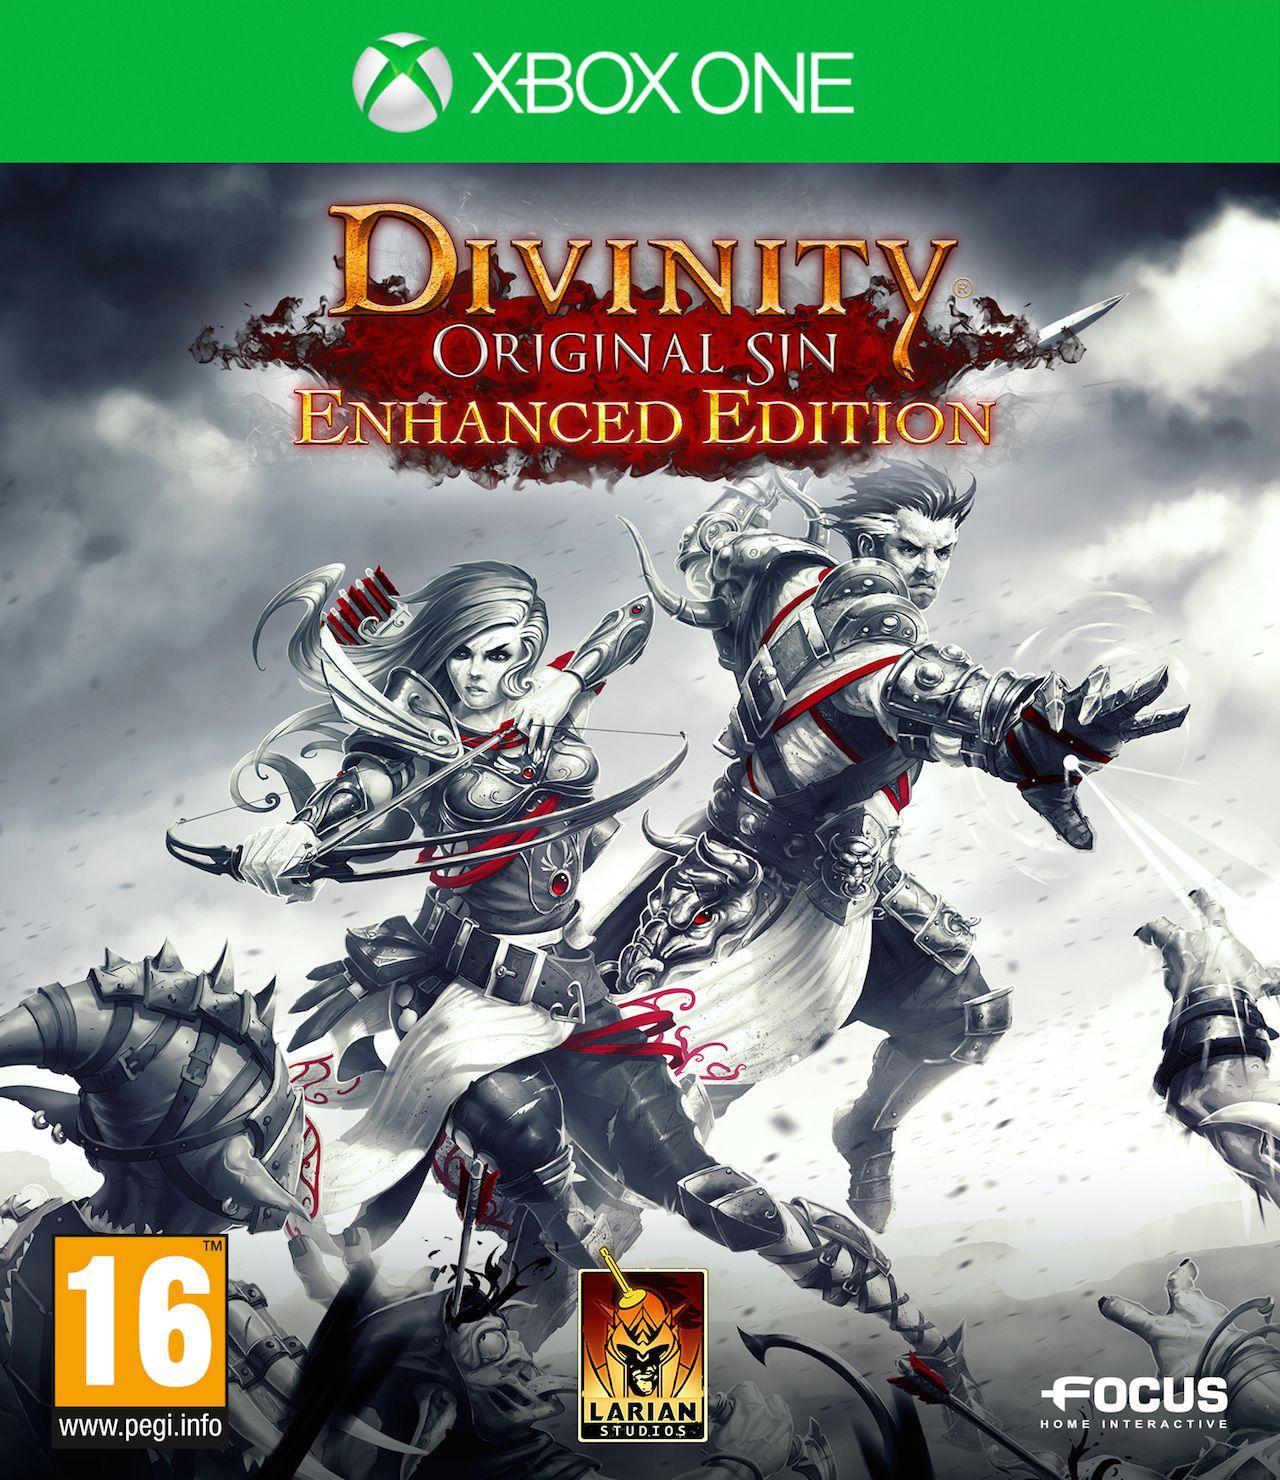 Divinity: Original Sin - Enhanced Edition sur Xbox One